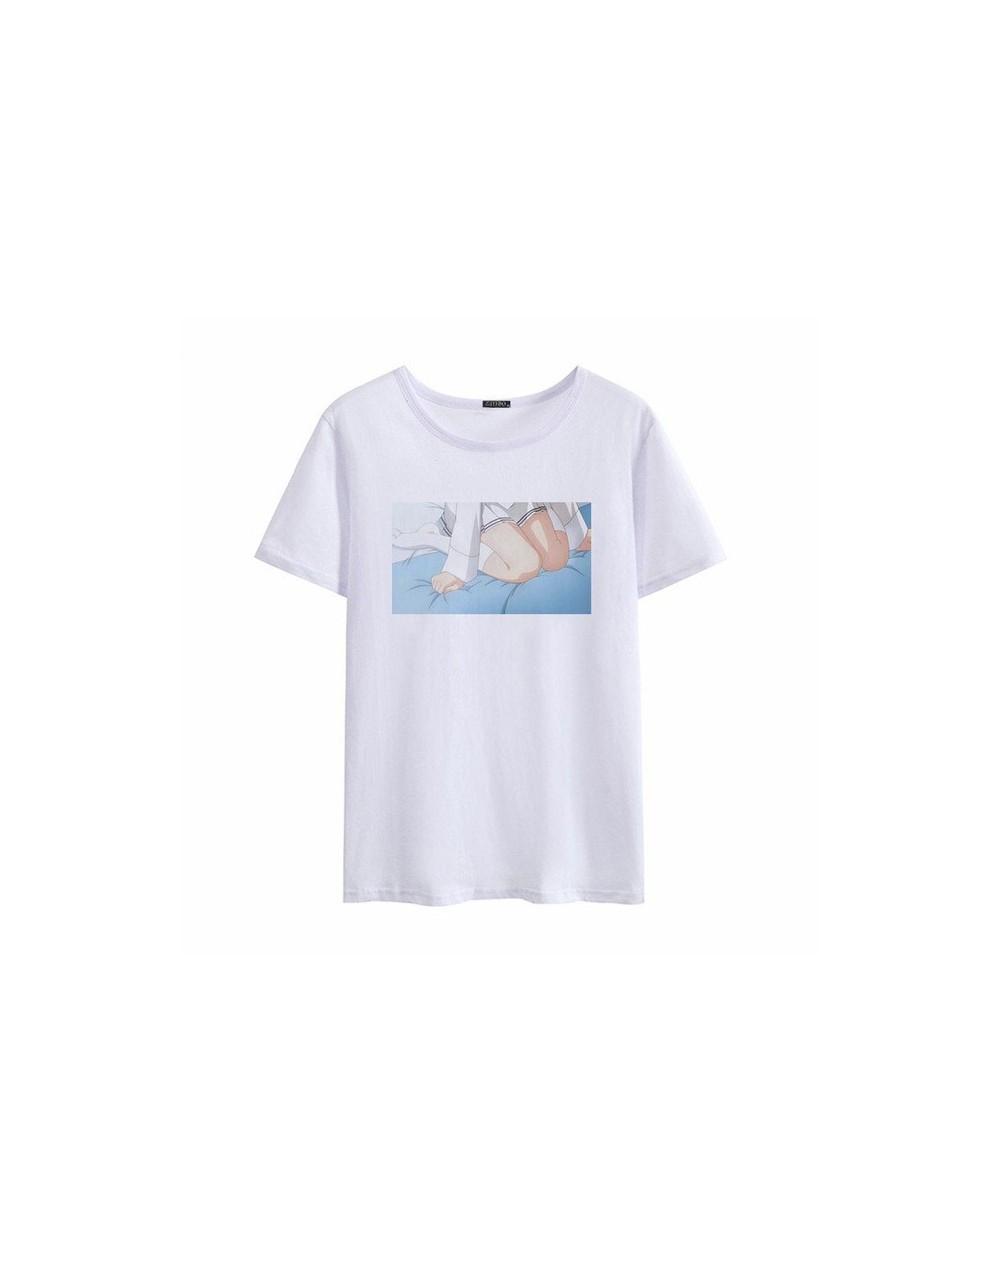 Summer new female Japanese cartoon short-sleeved T-shirt casual printing Harajuku large size O-neck cute tops - 8 - 47411437...